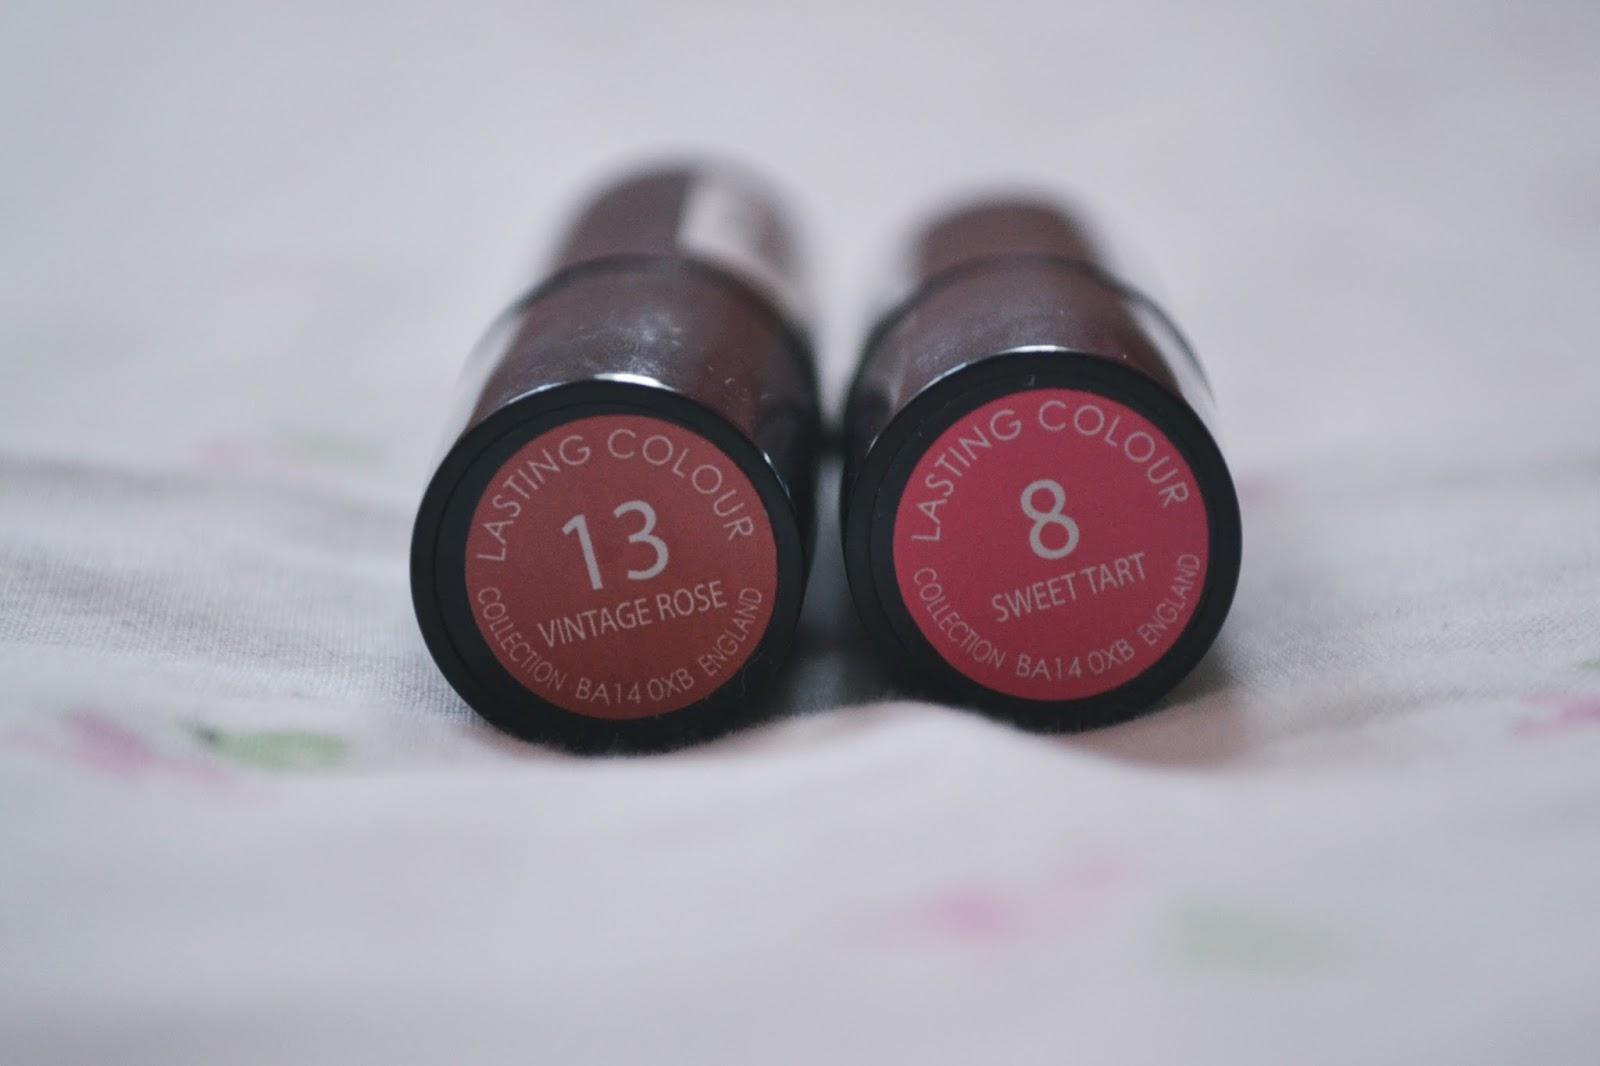 collection lasting colour lipstick vintage rose sweet tart